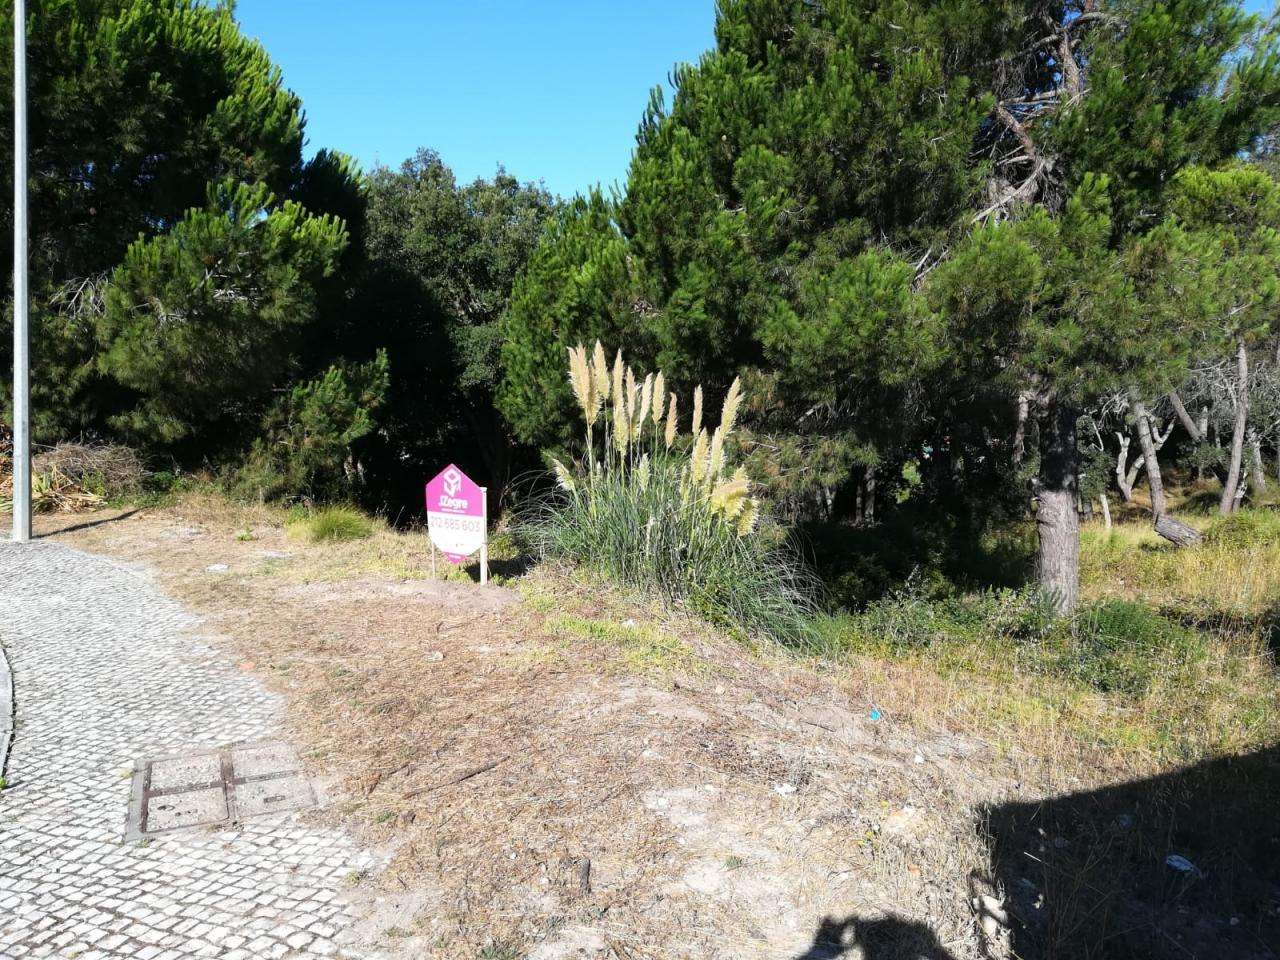 Terreno para comprar, Castelo (Sesimbra), Setúbal - Foto 3